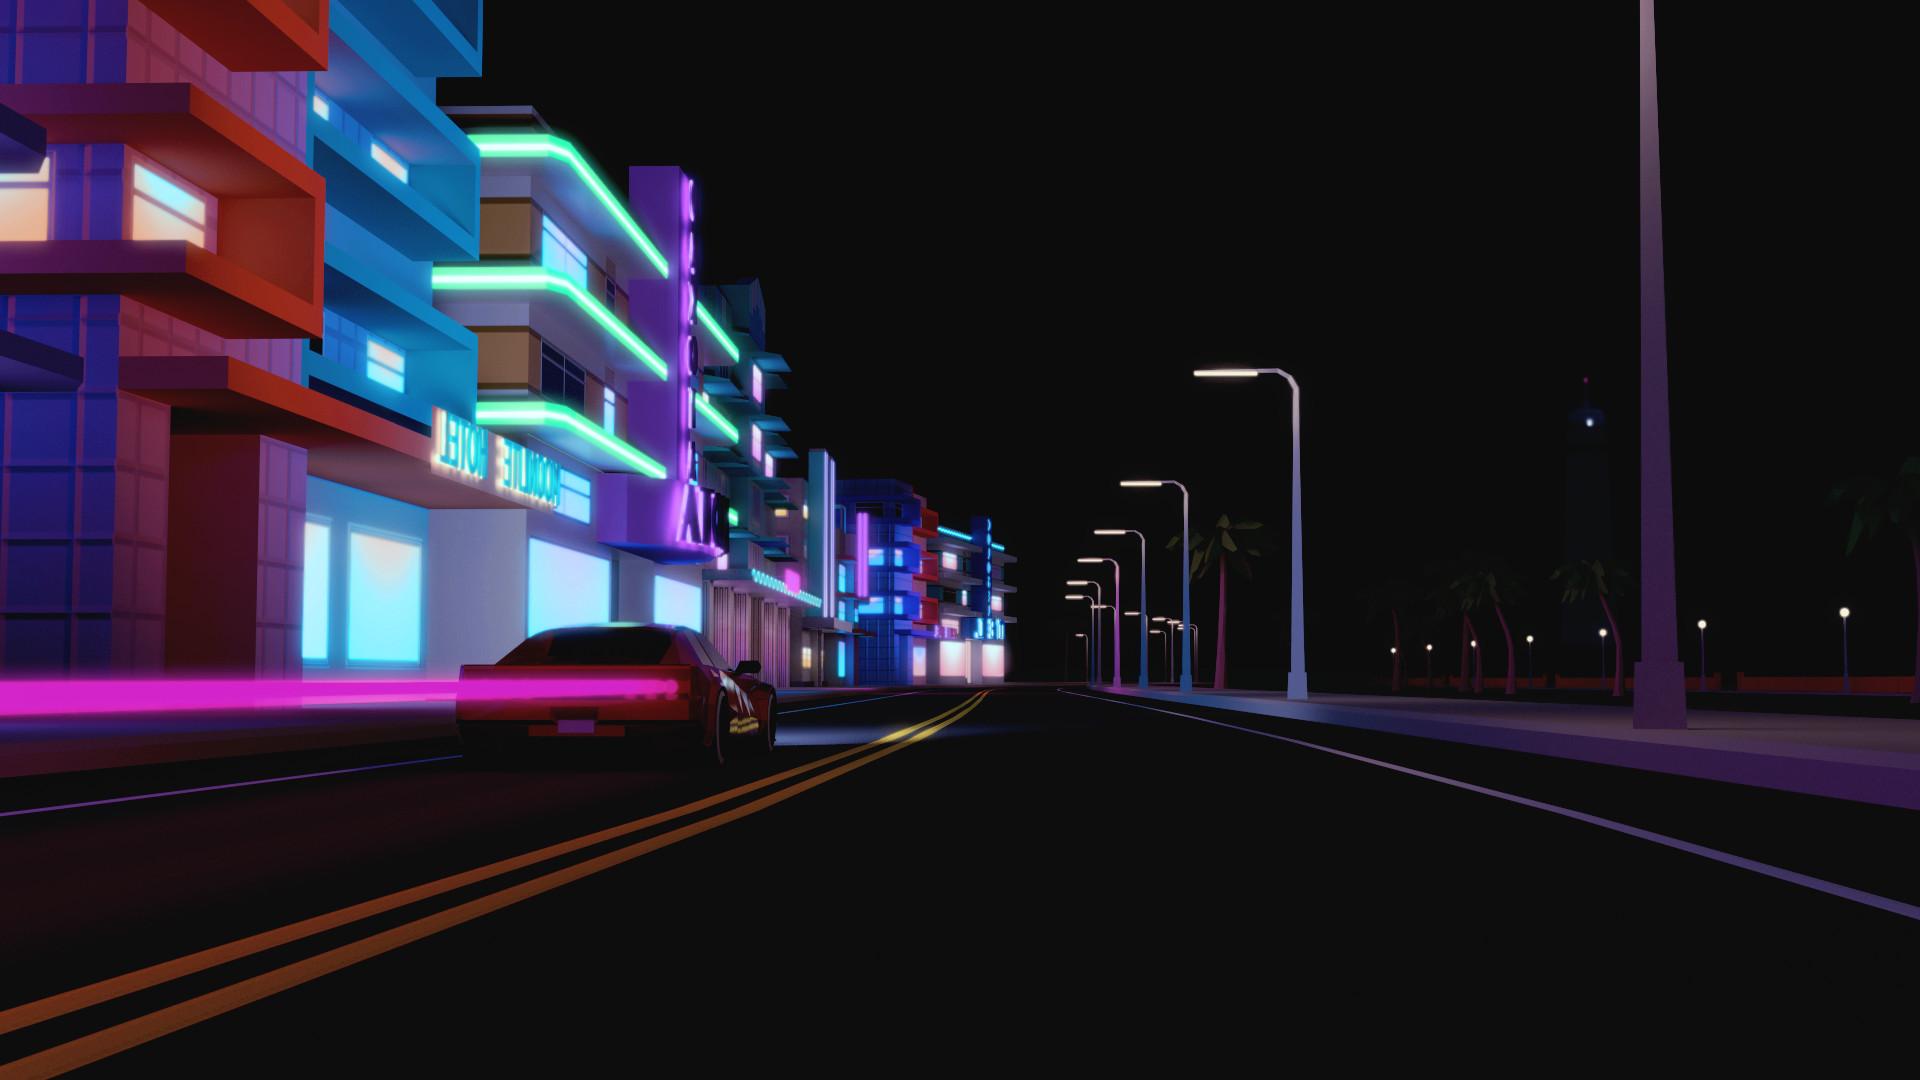 city, Urban, Street, Car, CGI, Render, Building, Night,